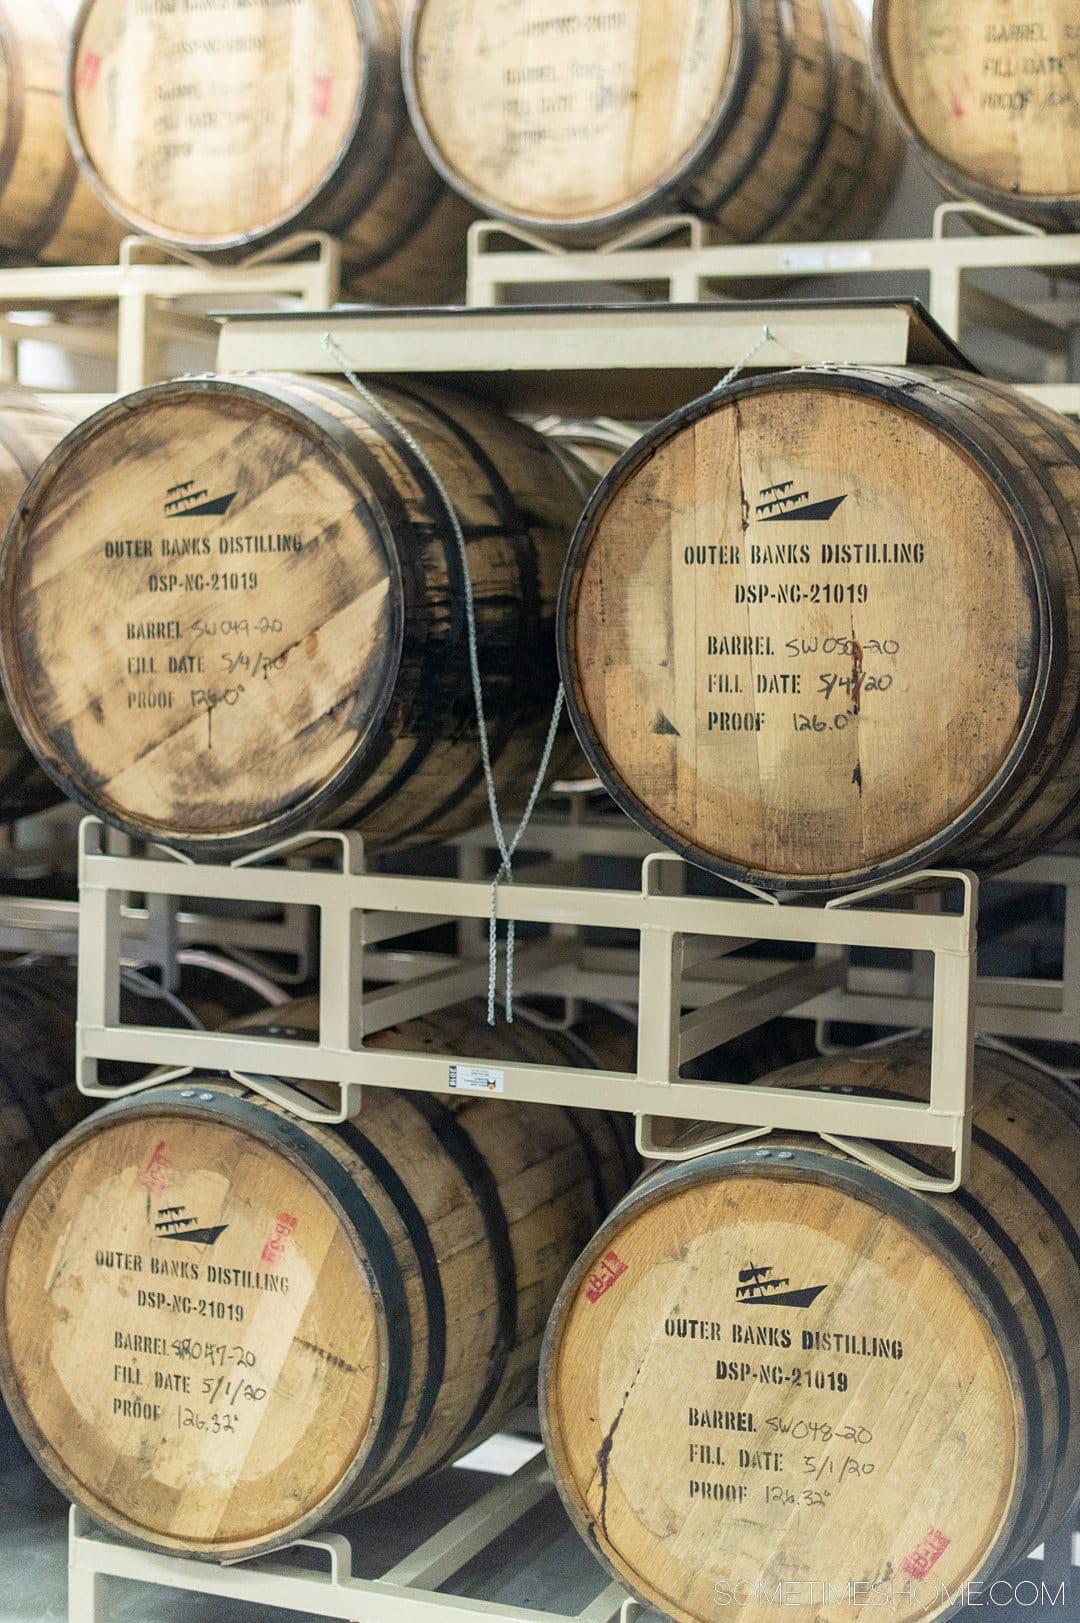 Barrels on shelves for rum distilling in the Outer Banks of North Carolina.